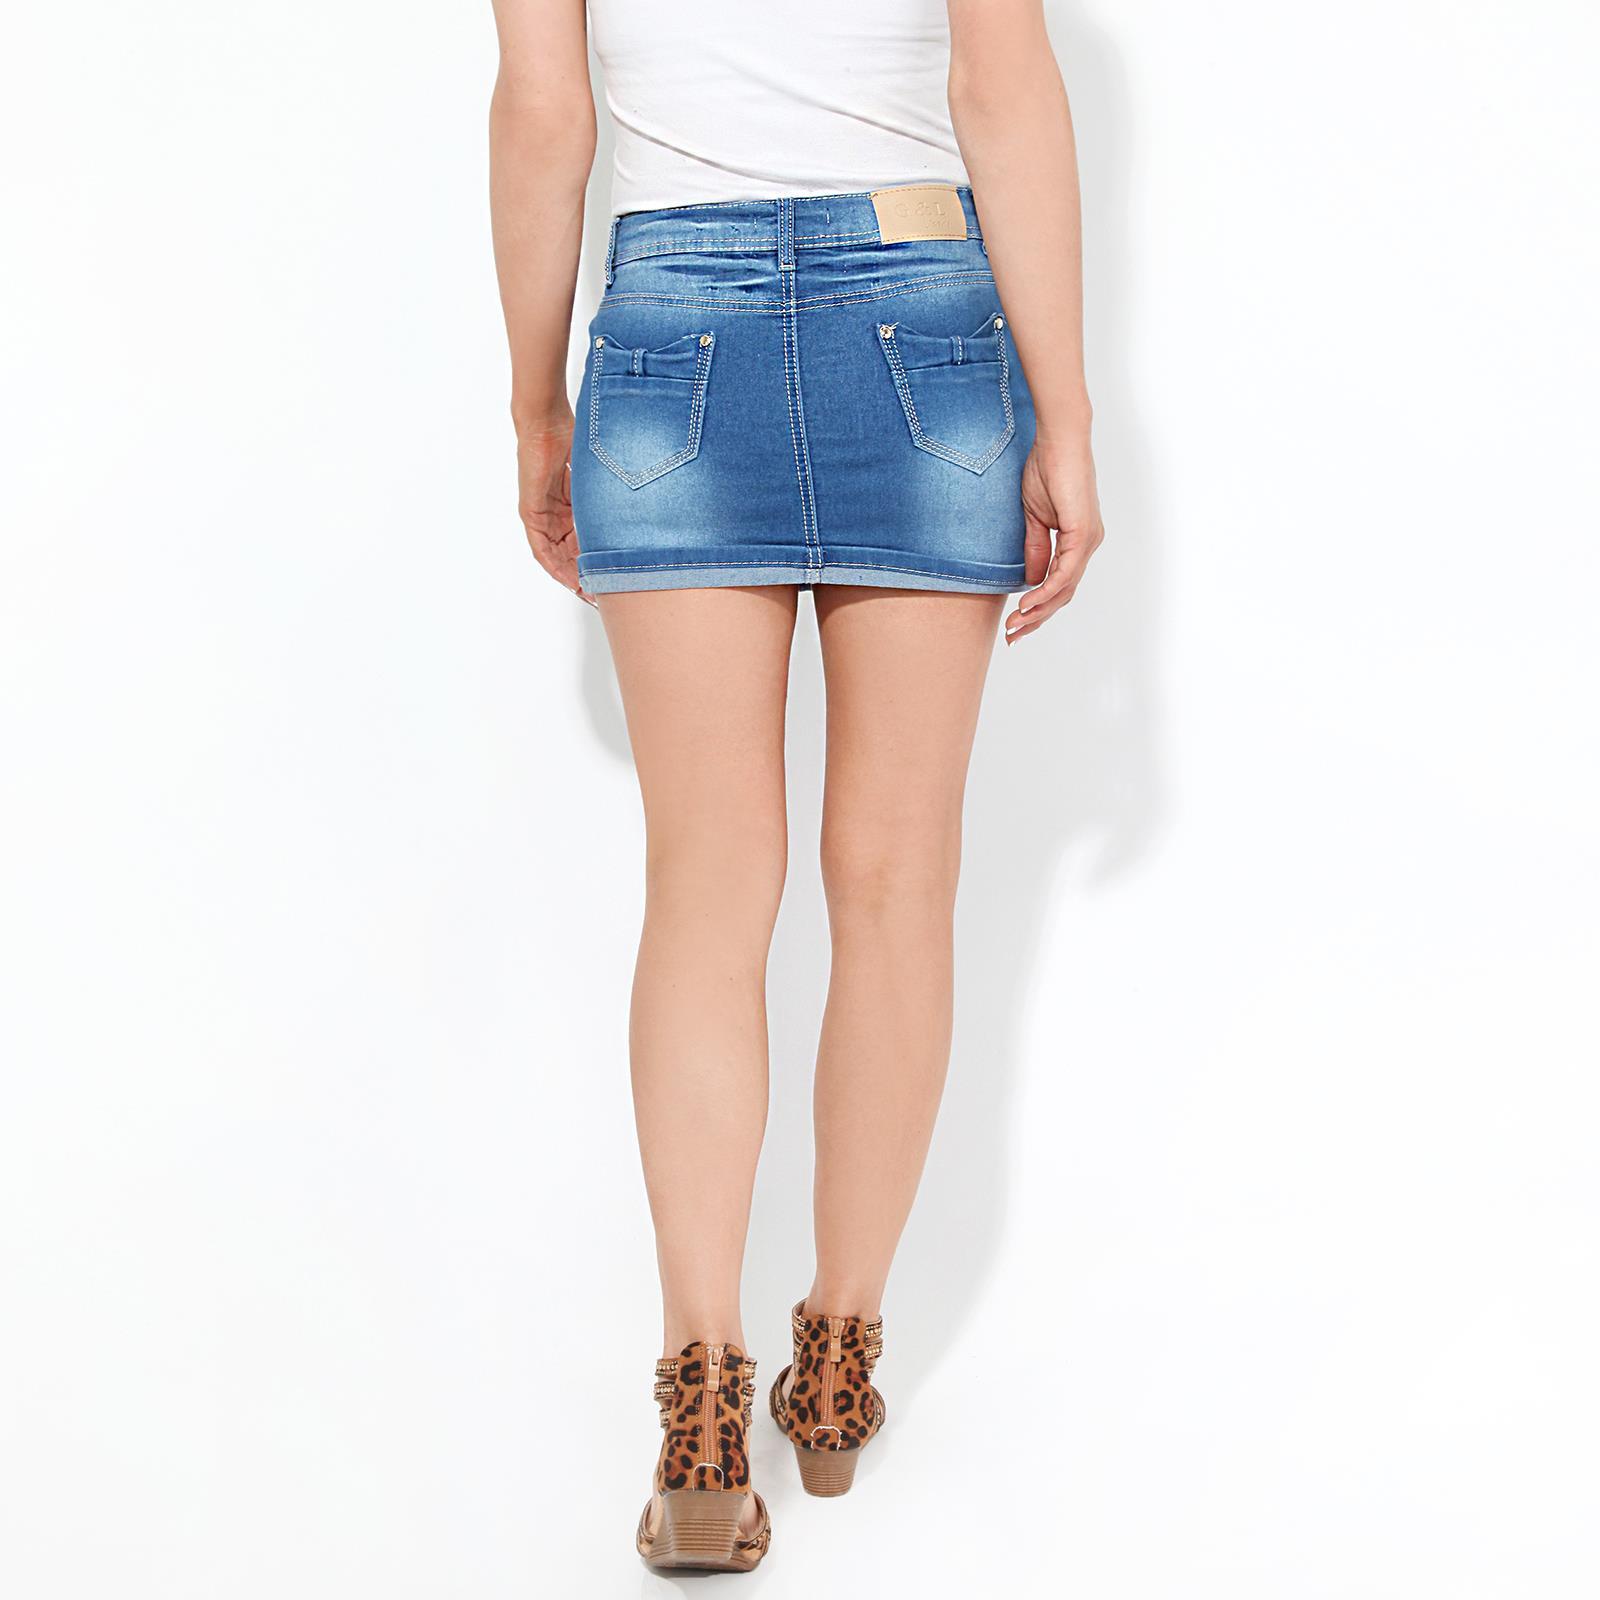 Micro-Mini-Jupe-Femme-Sexy-Courte-Moulante-Grandes-Tailles-Crayon-Bleu-Pas-Cher miniature 3